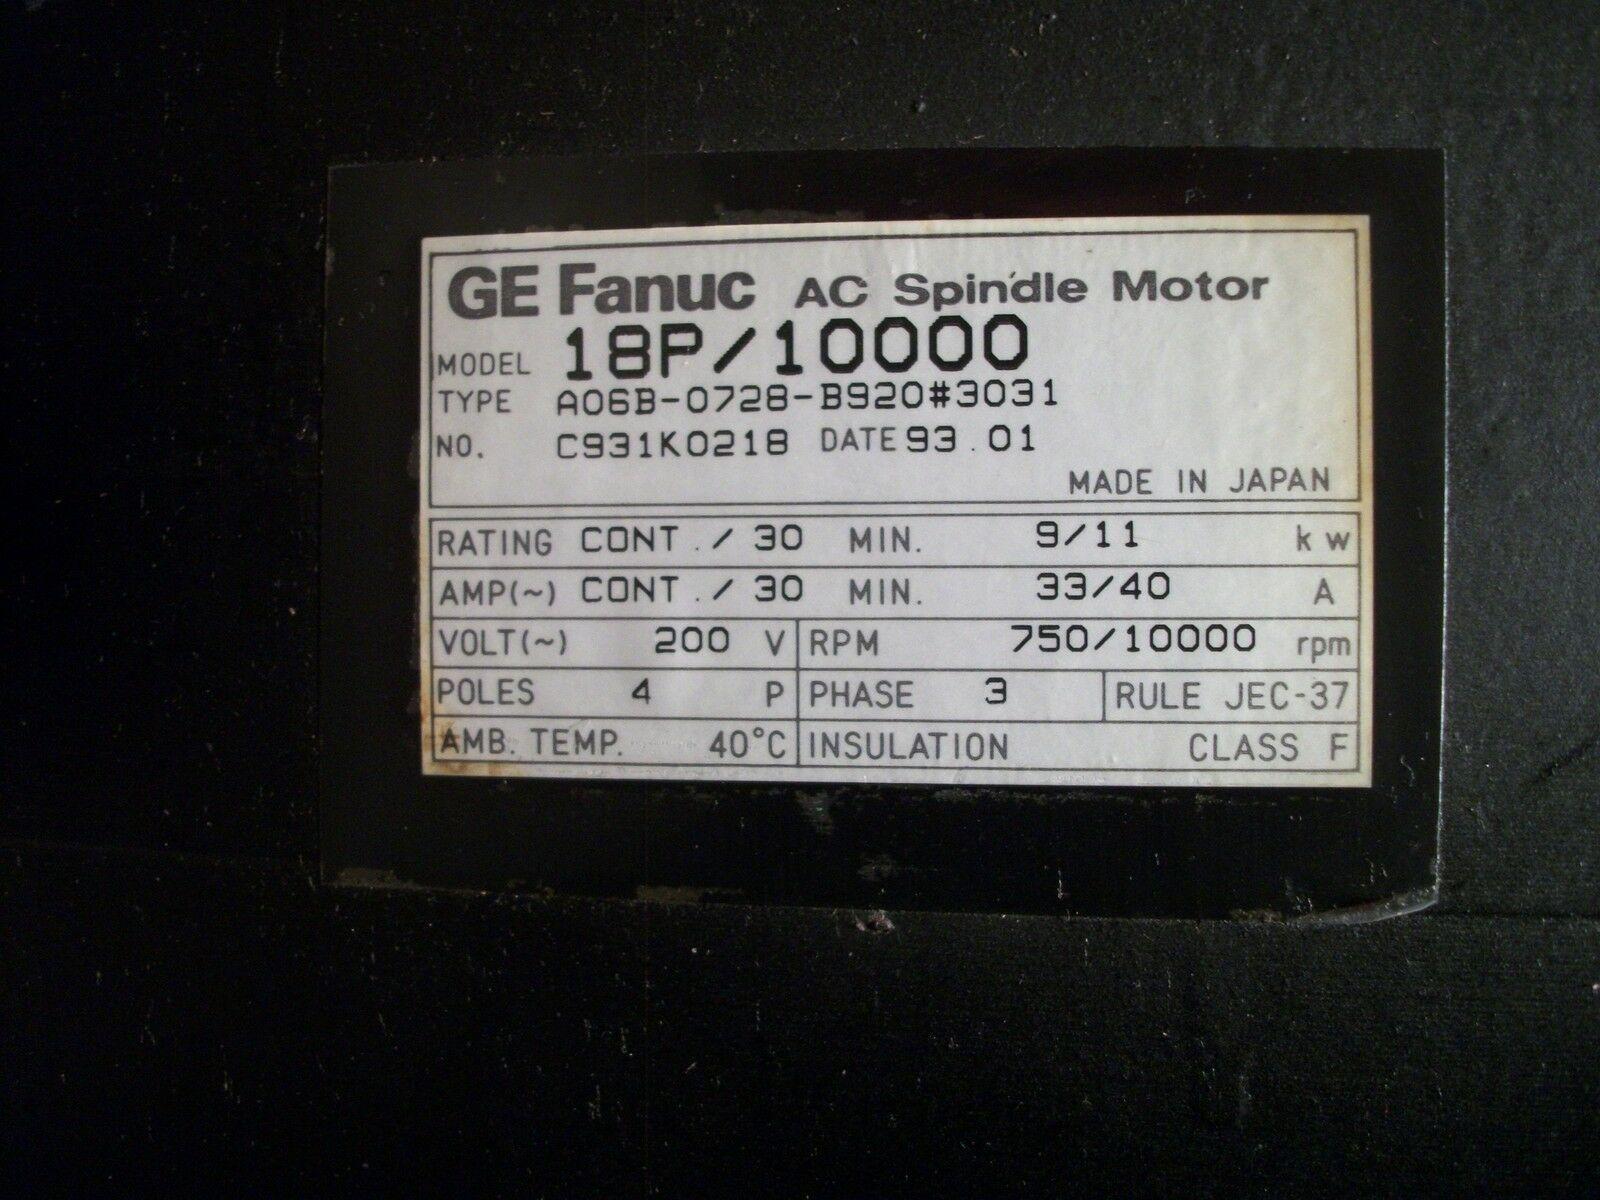 Fanuc Spindle Motor Model 18P/1000 A06B-0728-B920 #3031